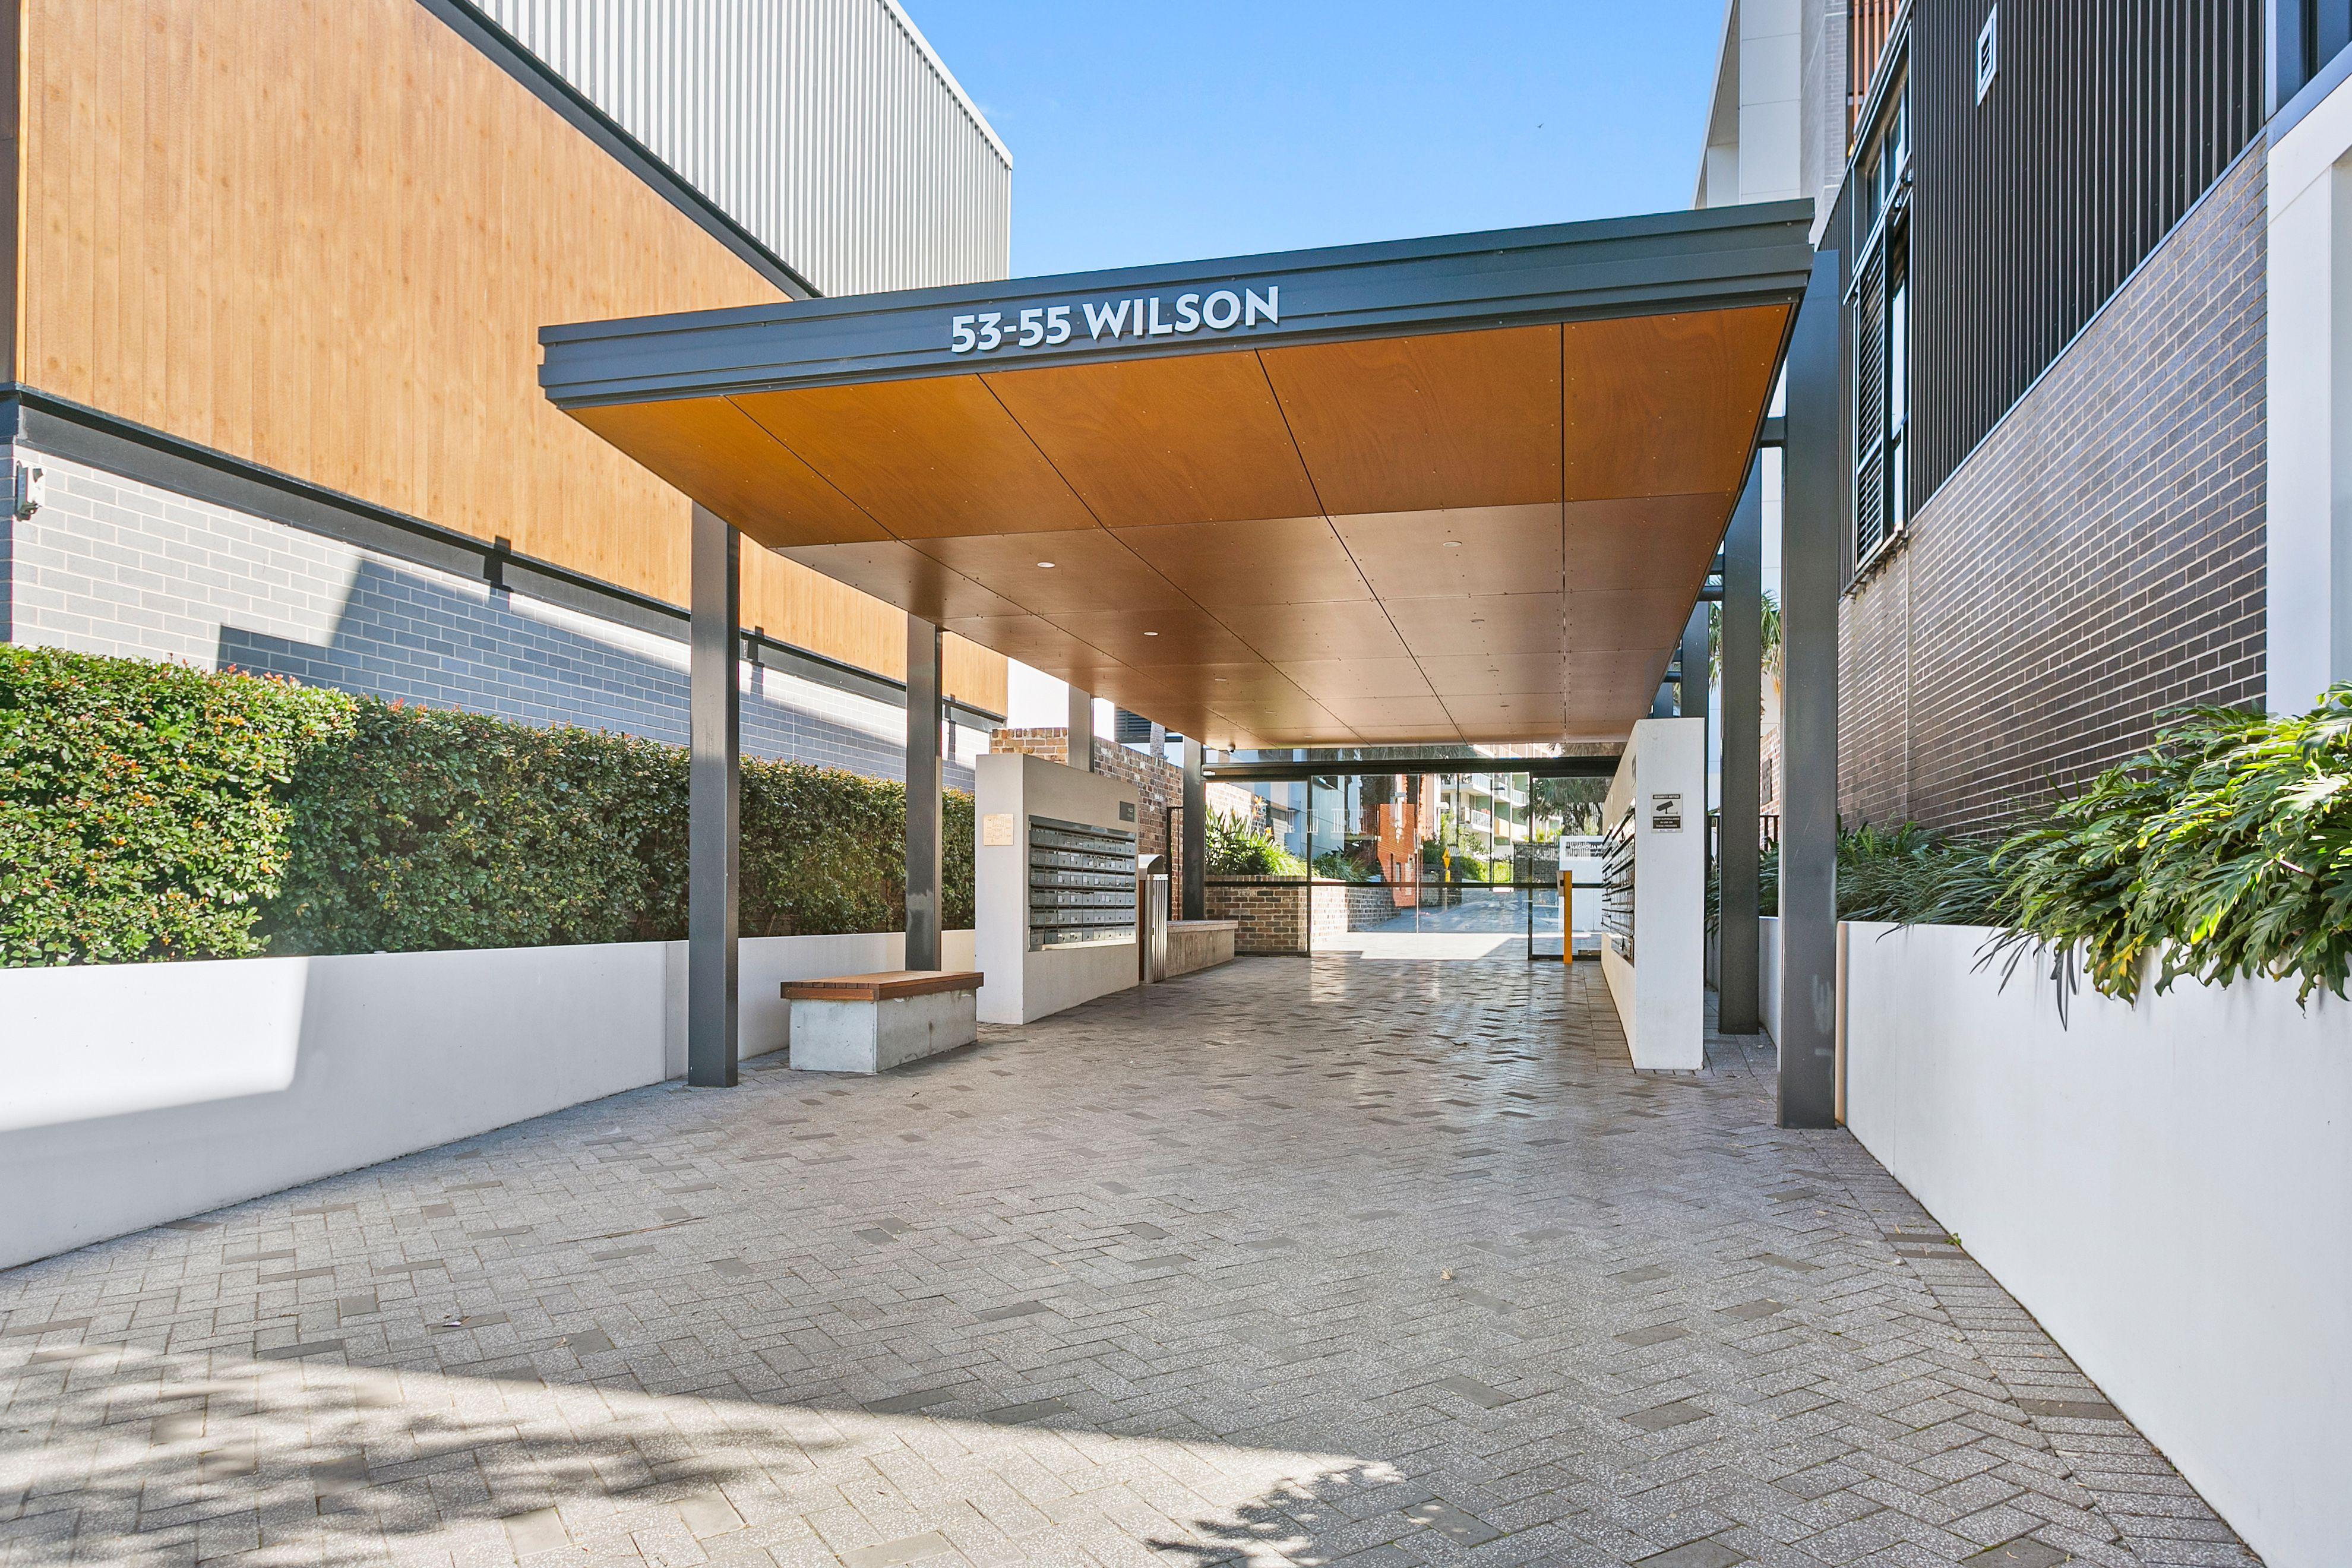 E2407/53 Wilson Street, Botany